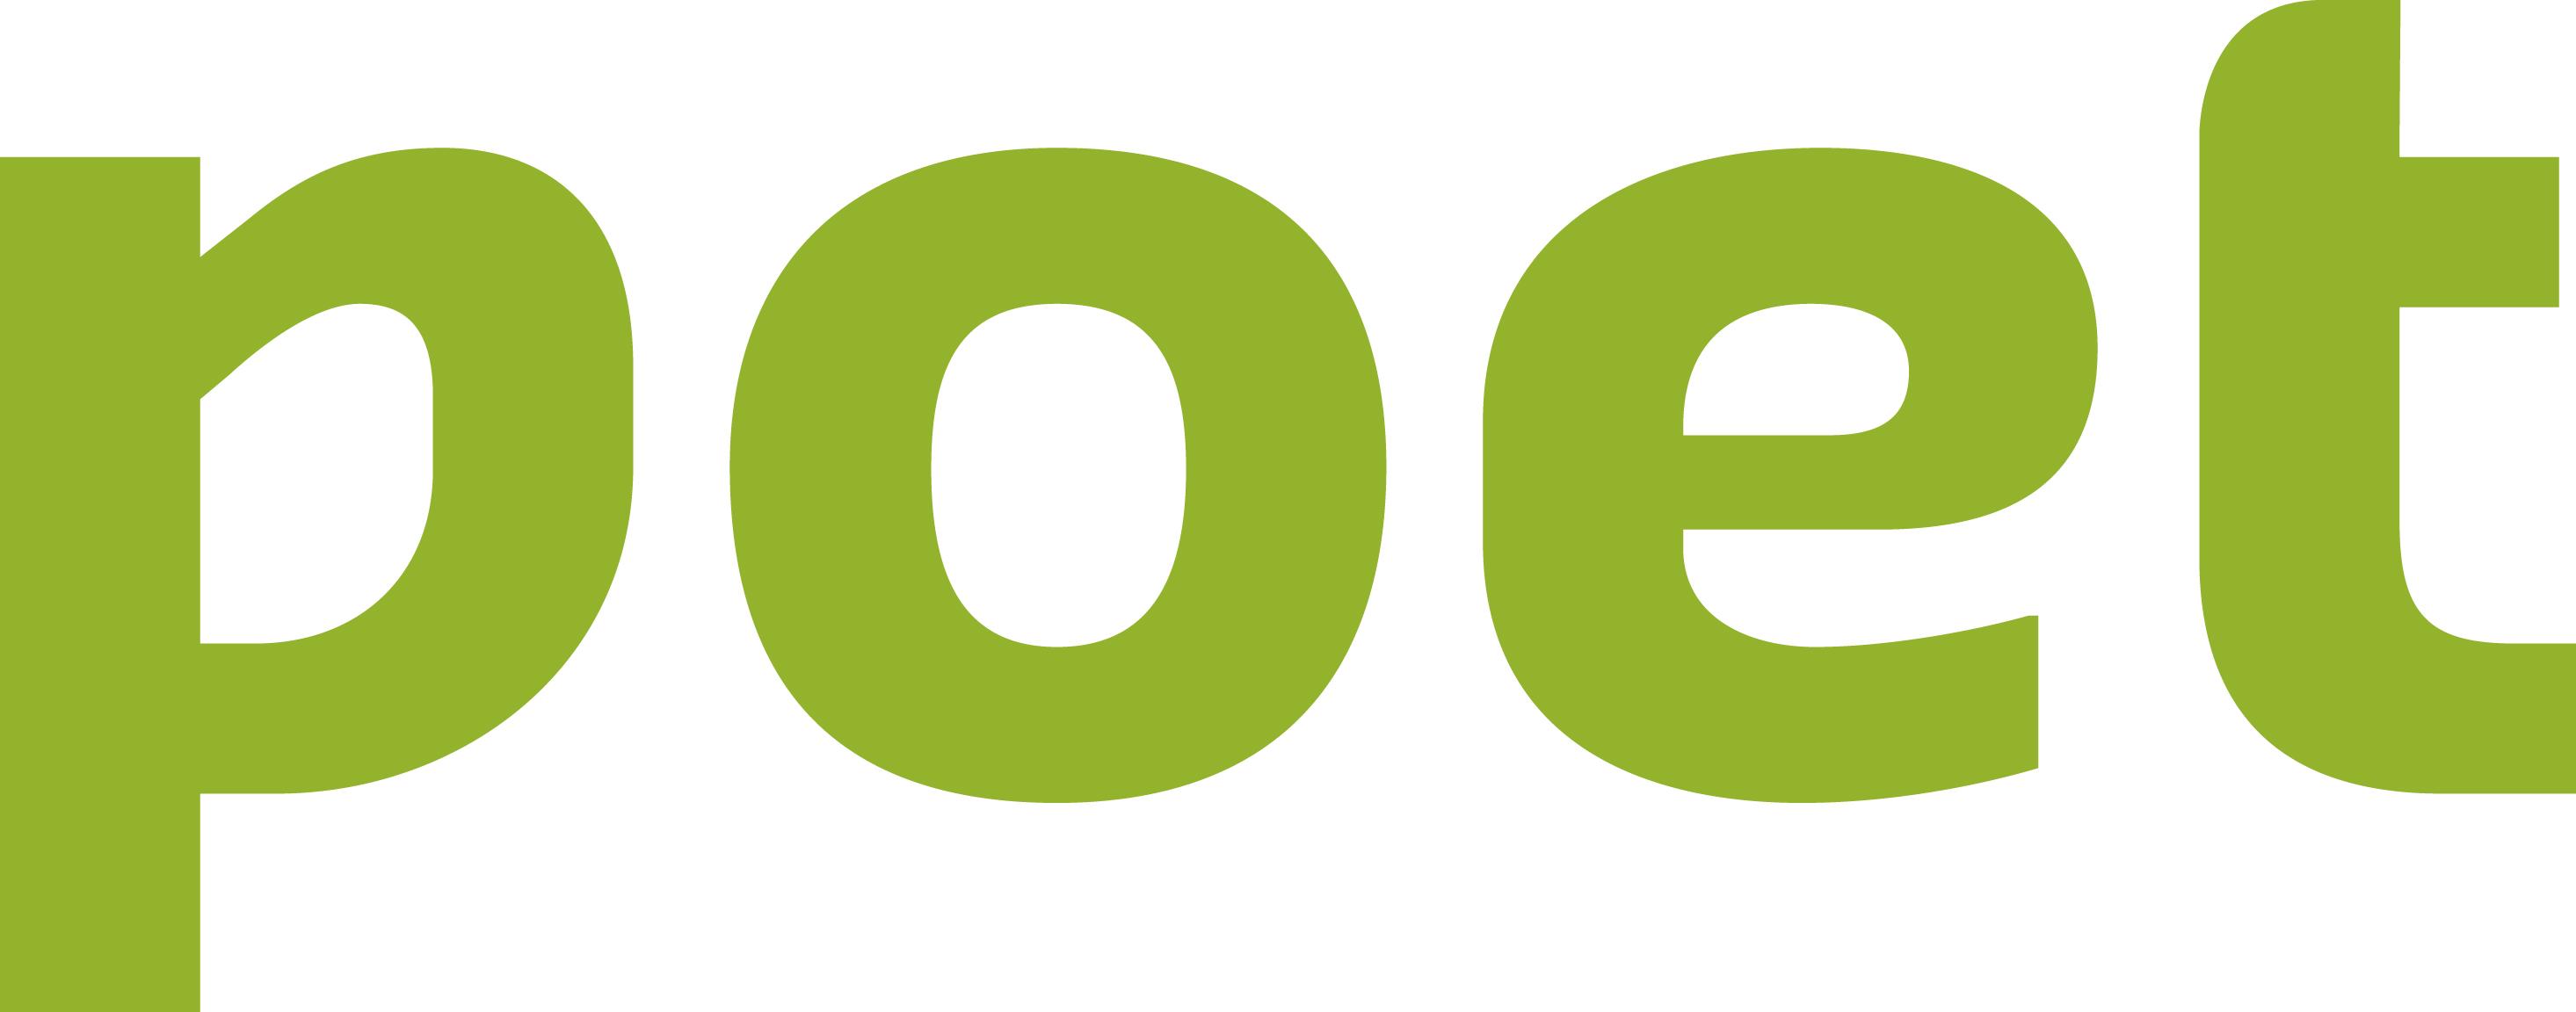 Poet Logo